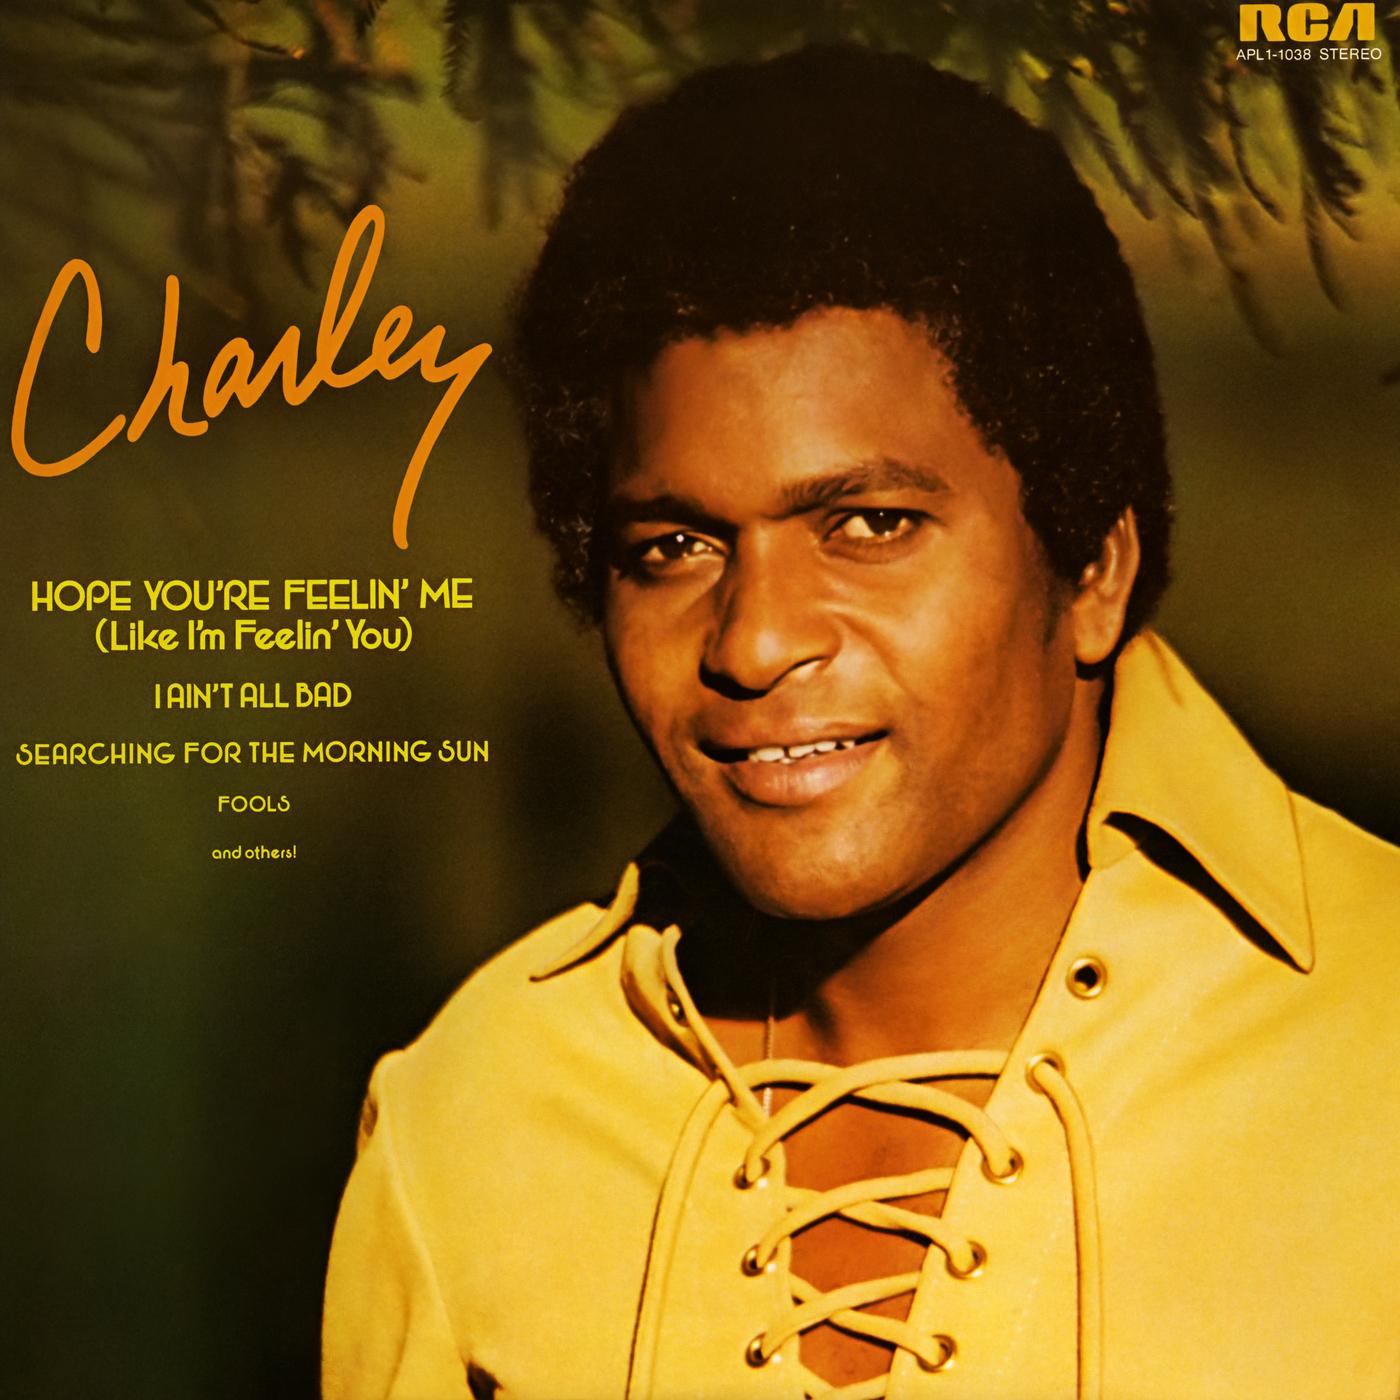 Charley - Charley Pride